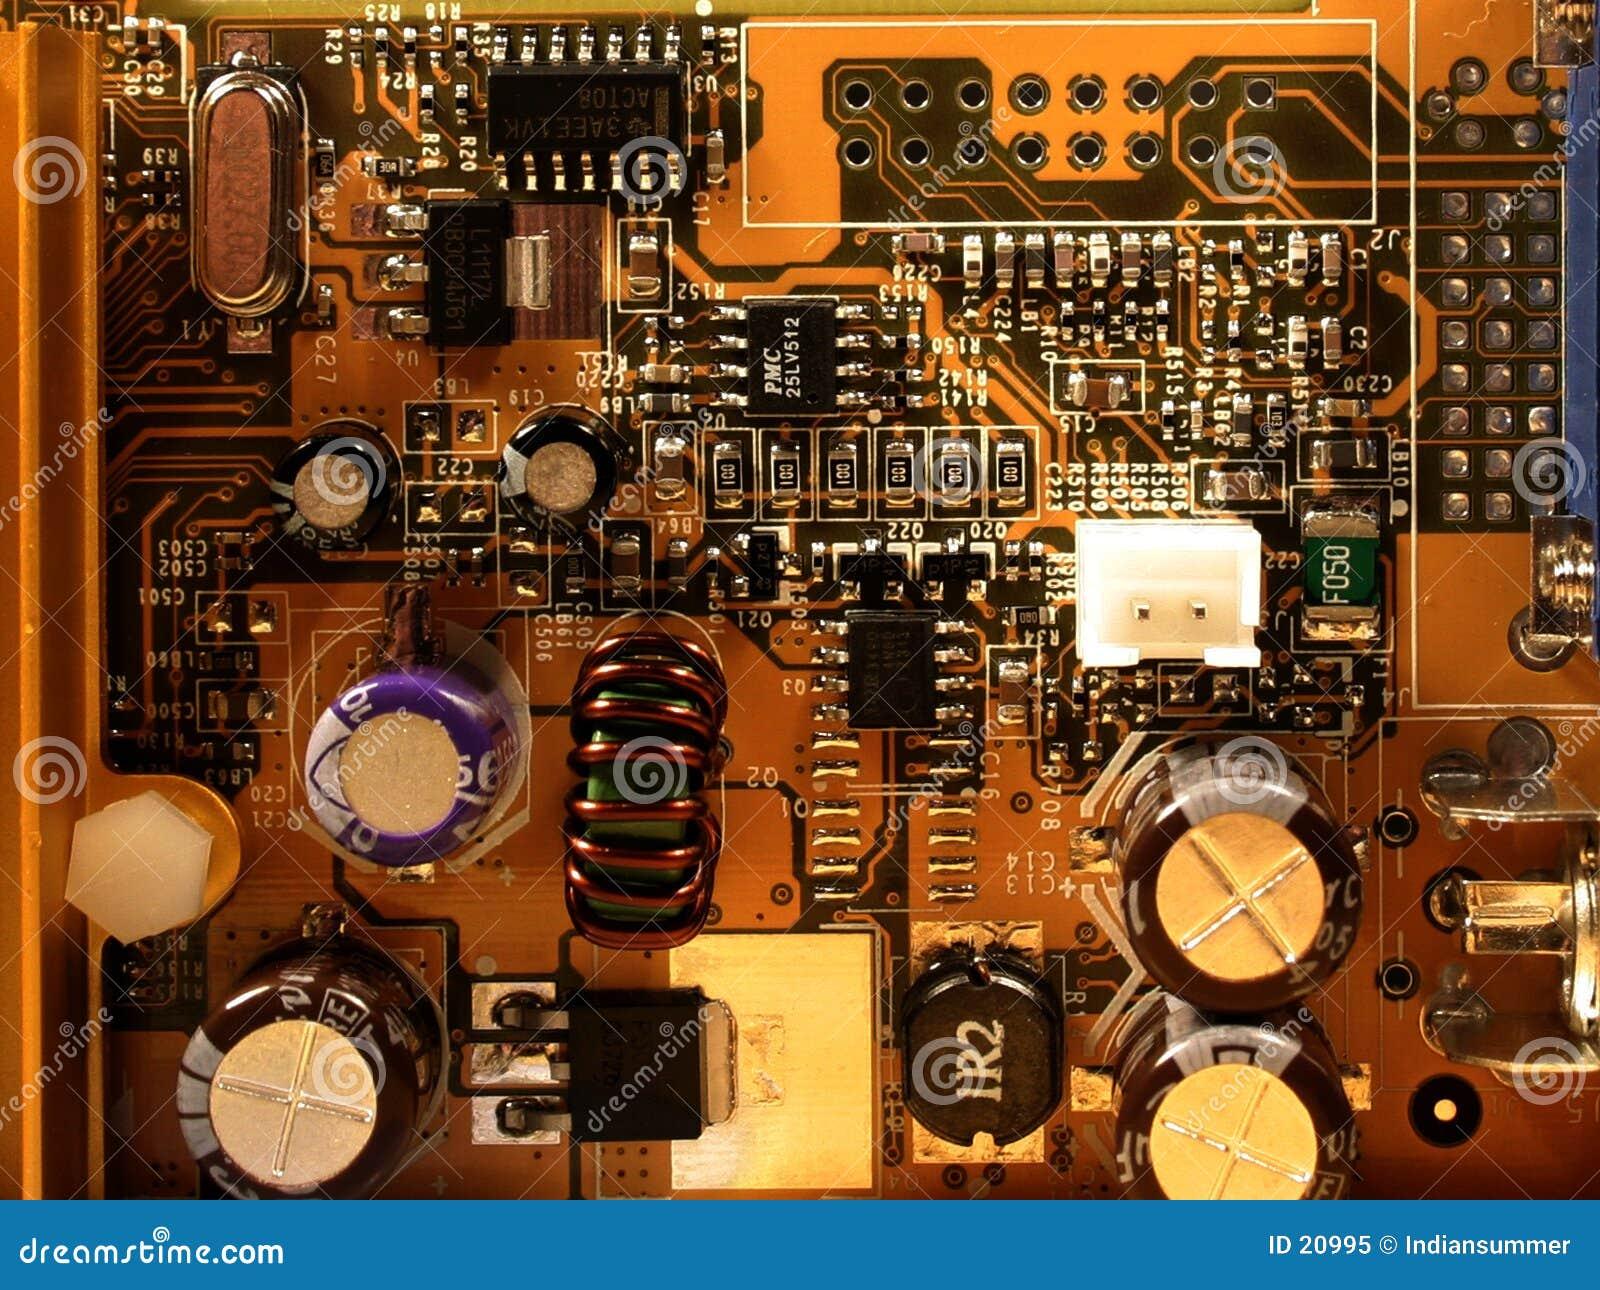 Microchip of videocard